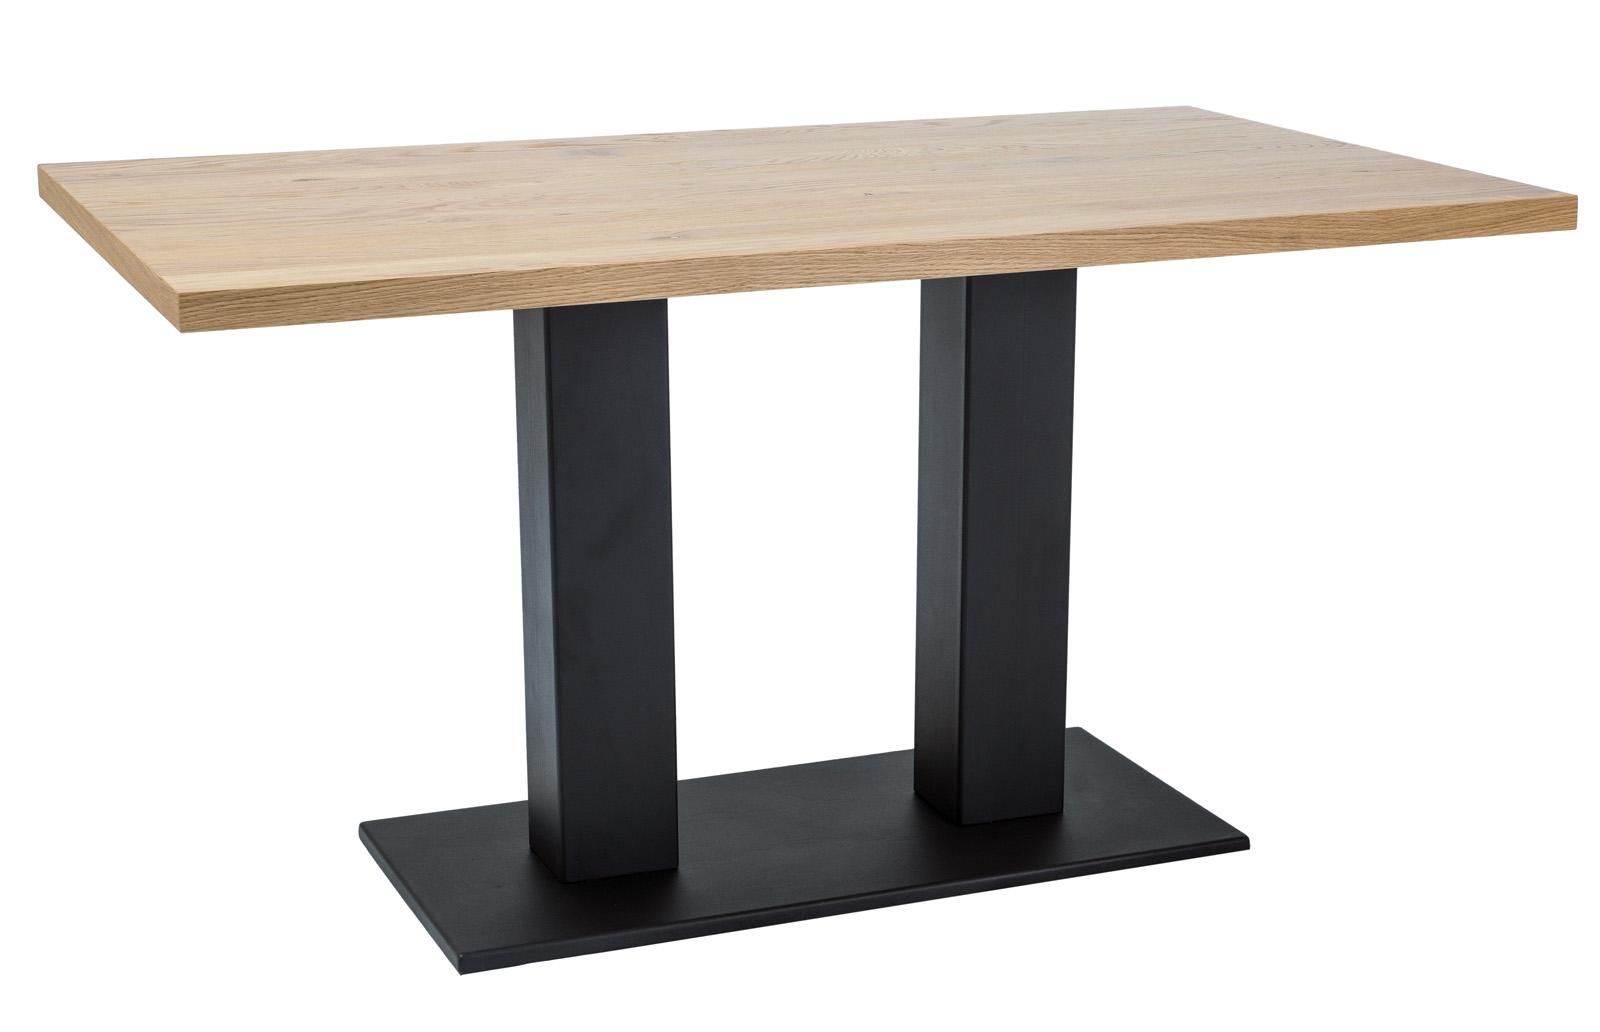 Masa din metal si lemn de stejar Sauron Dab, L120xl80xh78 cm imagine